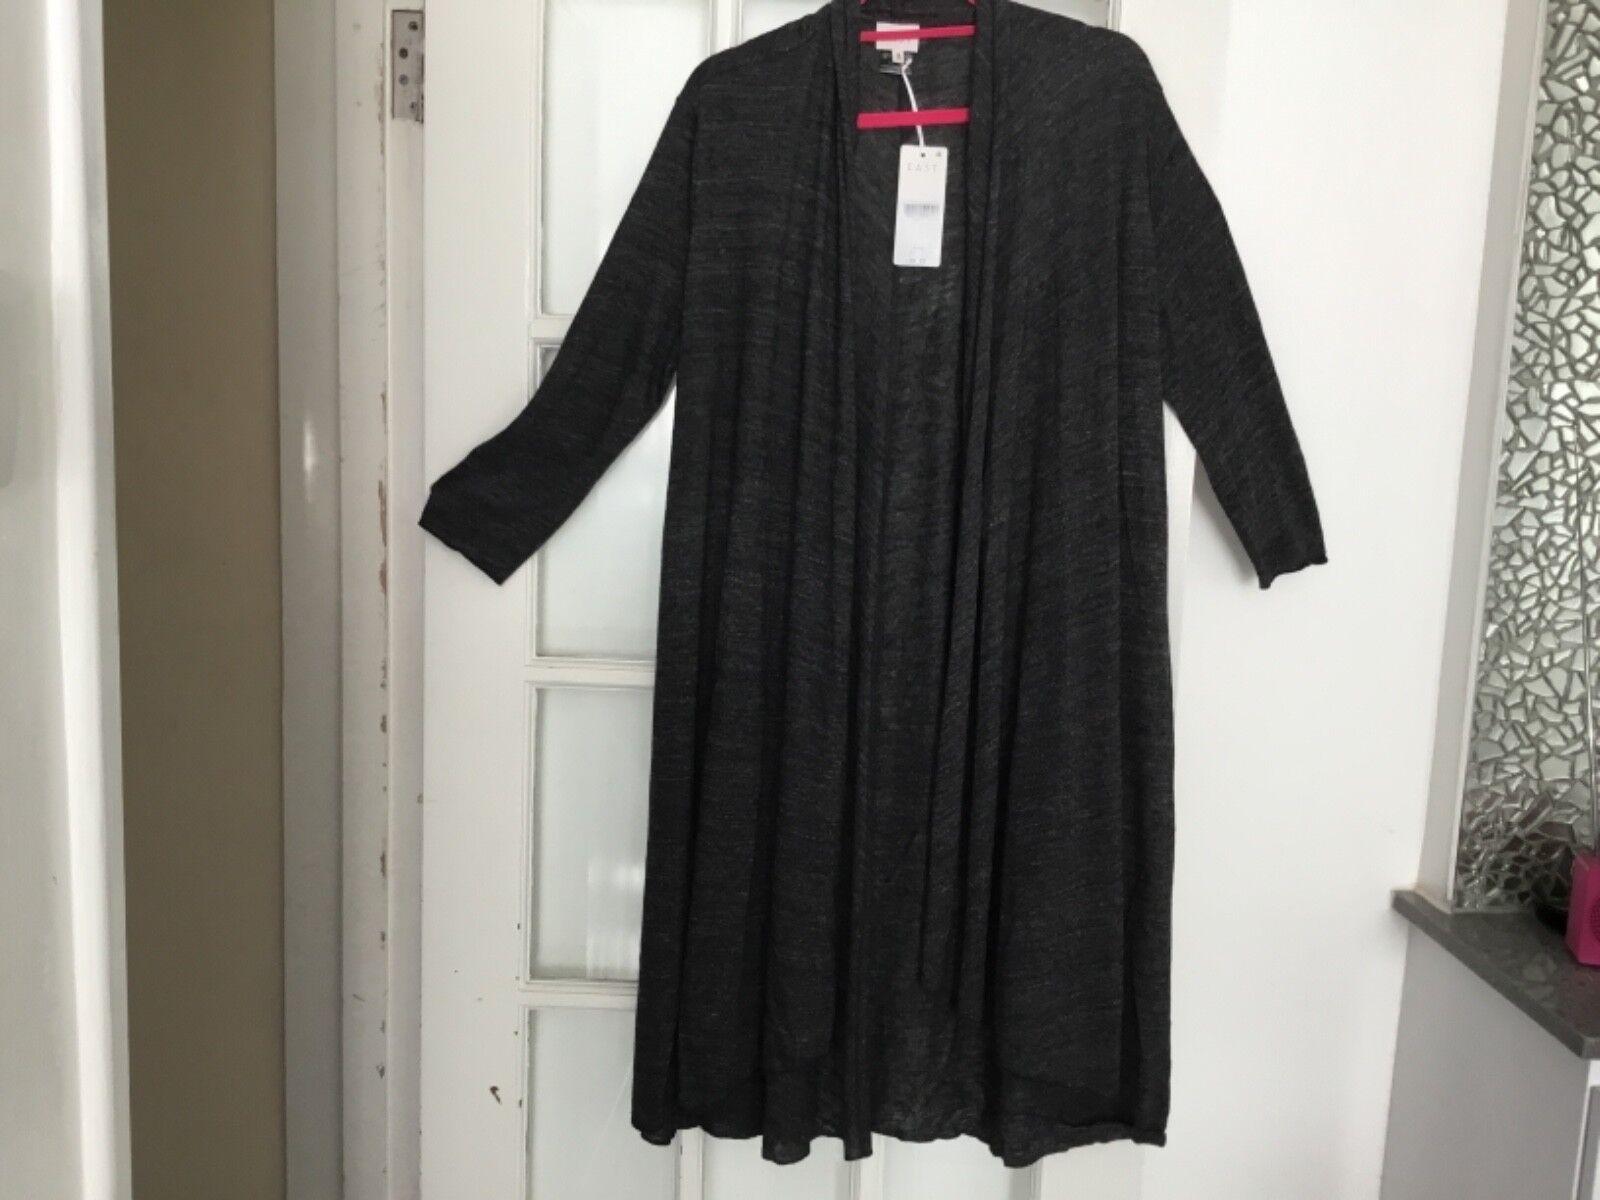 East John Lewis slate slate slate grey long cardigan duster size small fits 10 12 694834